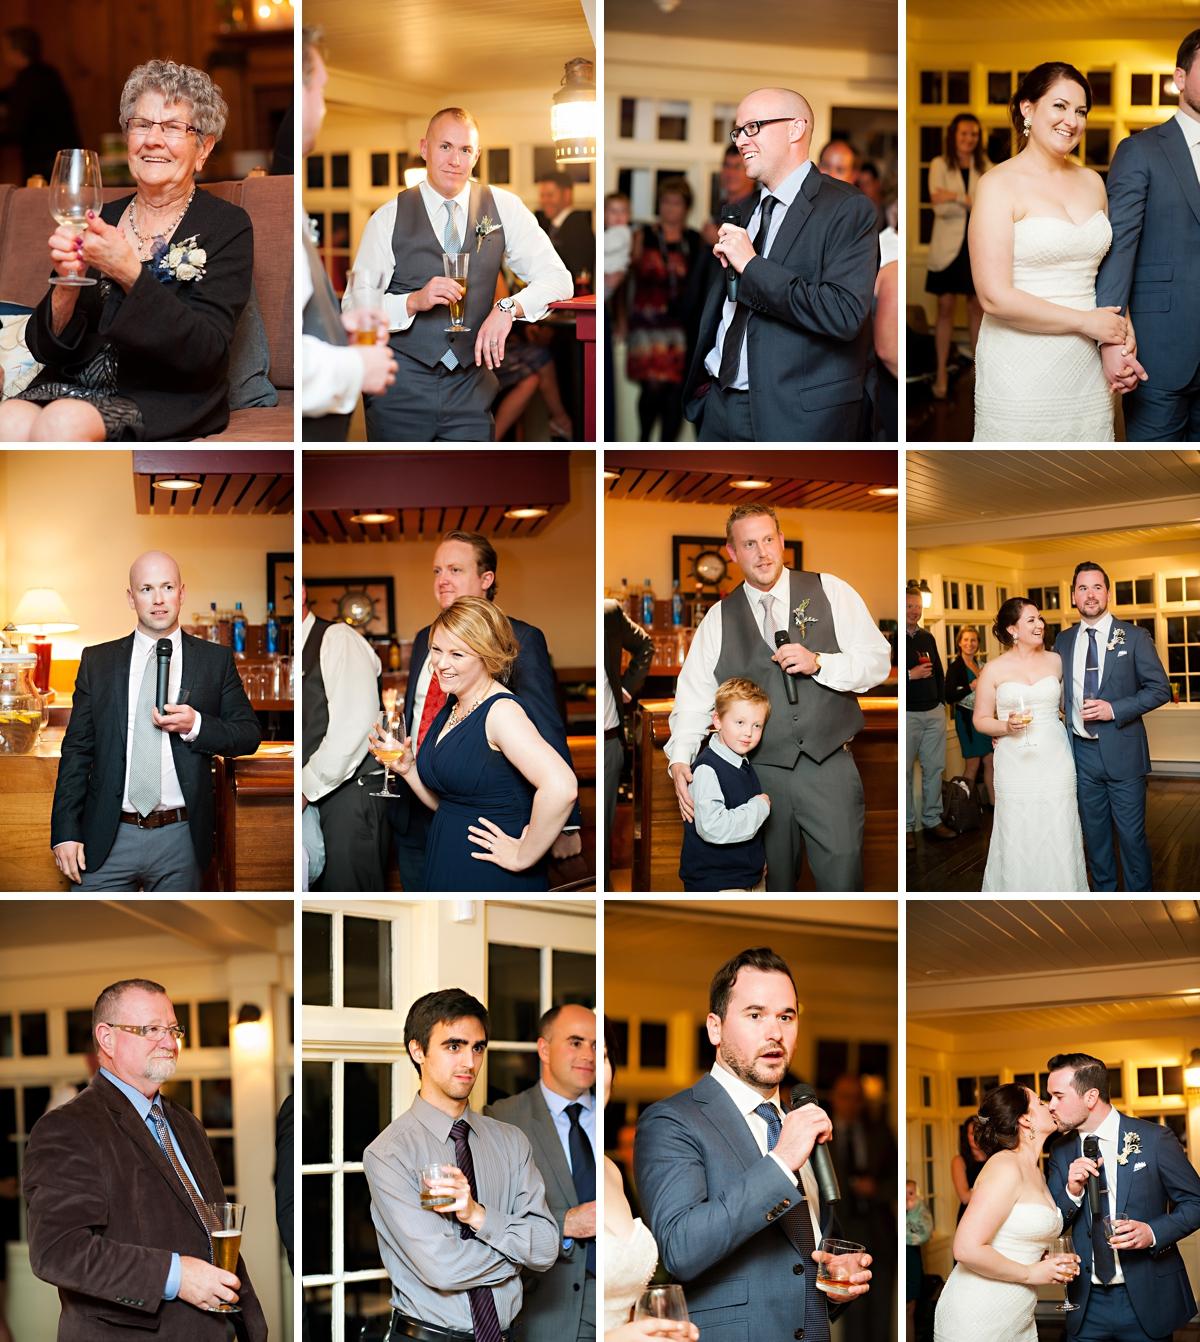 Julie & Taylor's Chester Captains House Wedding, Nova Scotia Wedding Photography118